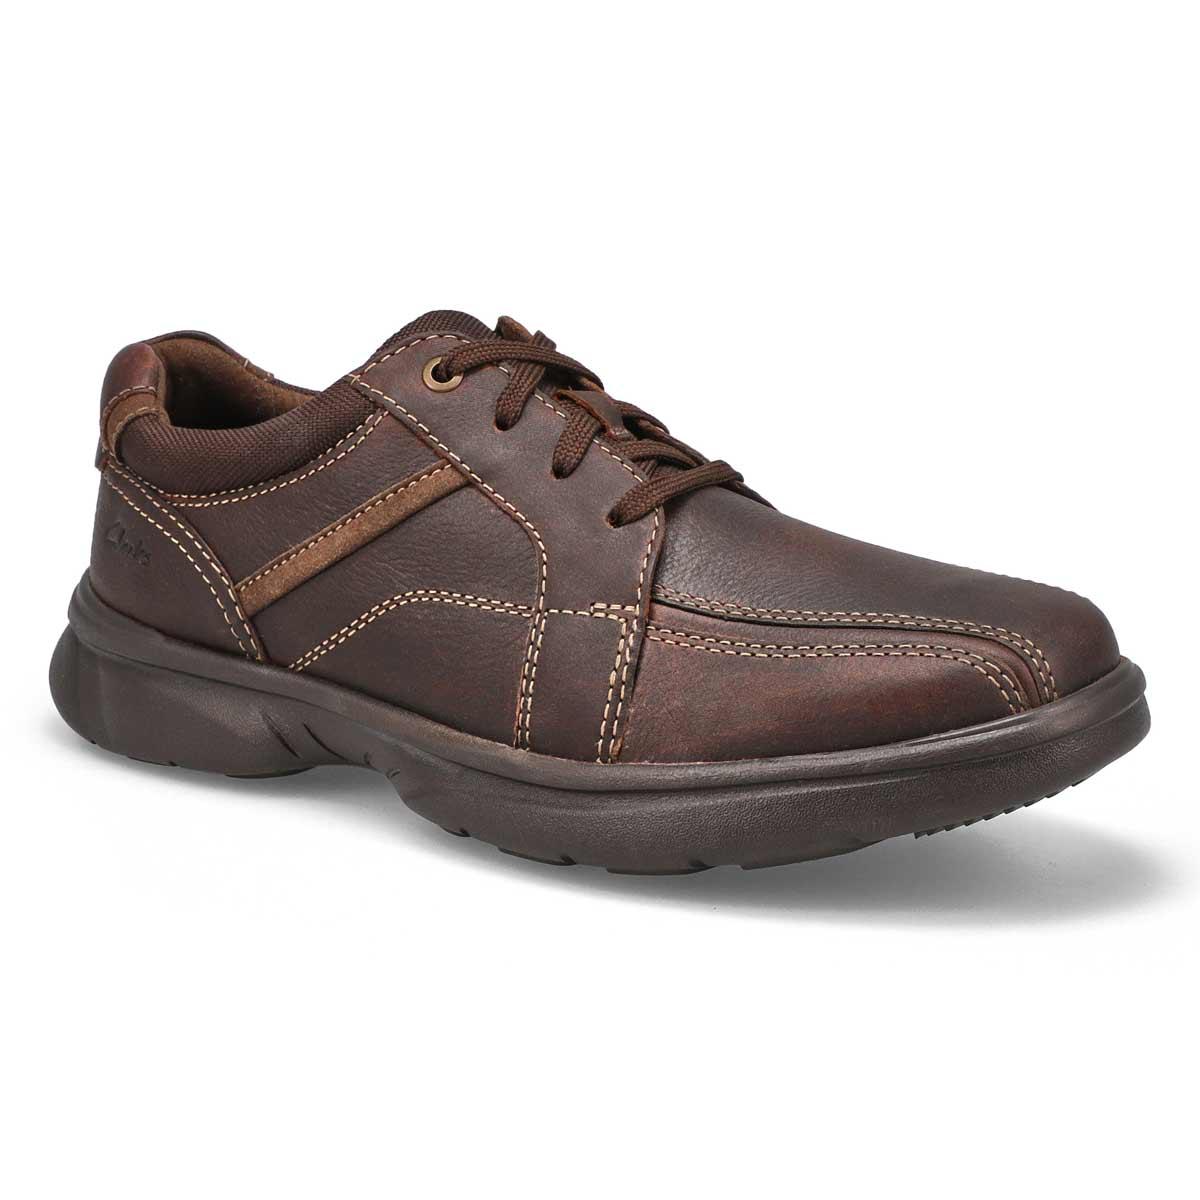 Men's Bradley Walk Casual Loafer - Brown